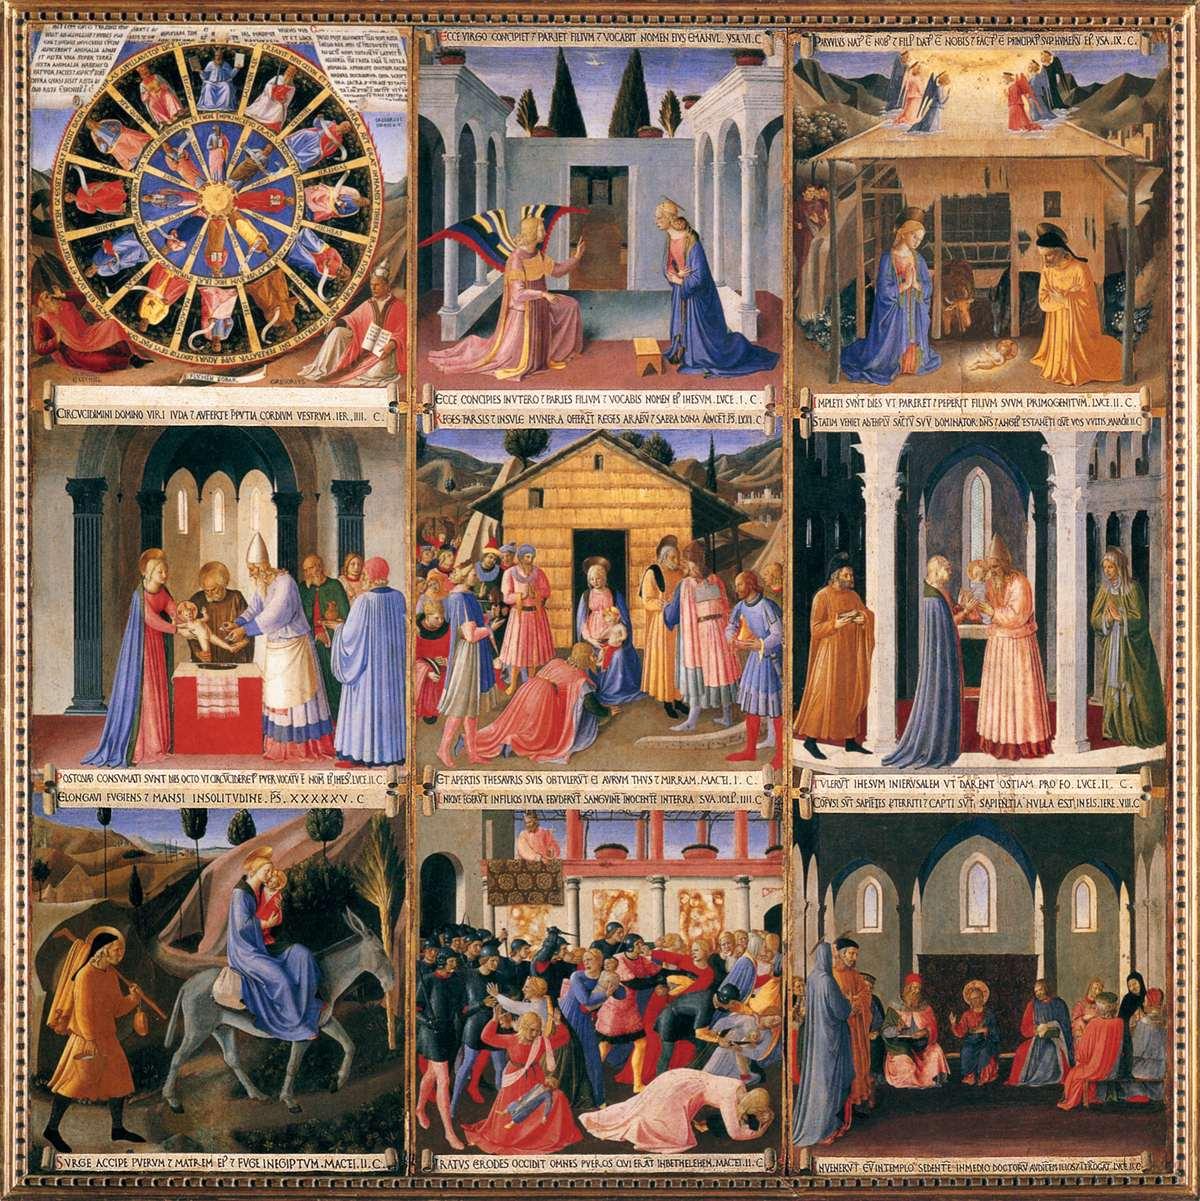 1450-52-Beato-Angelico-San-Marco-Argenti